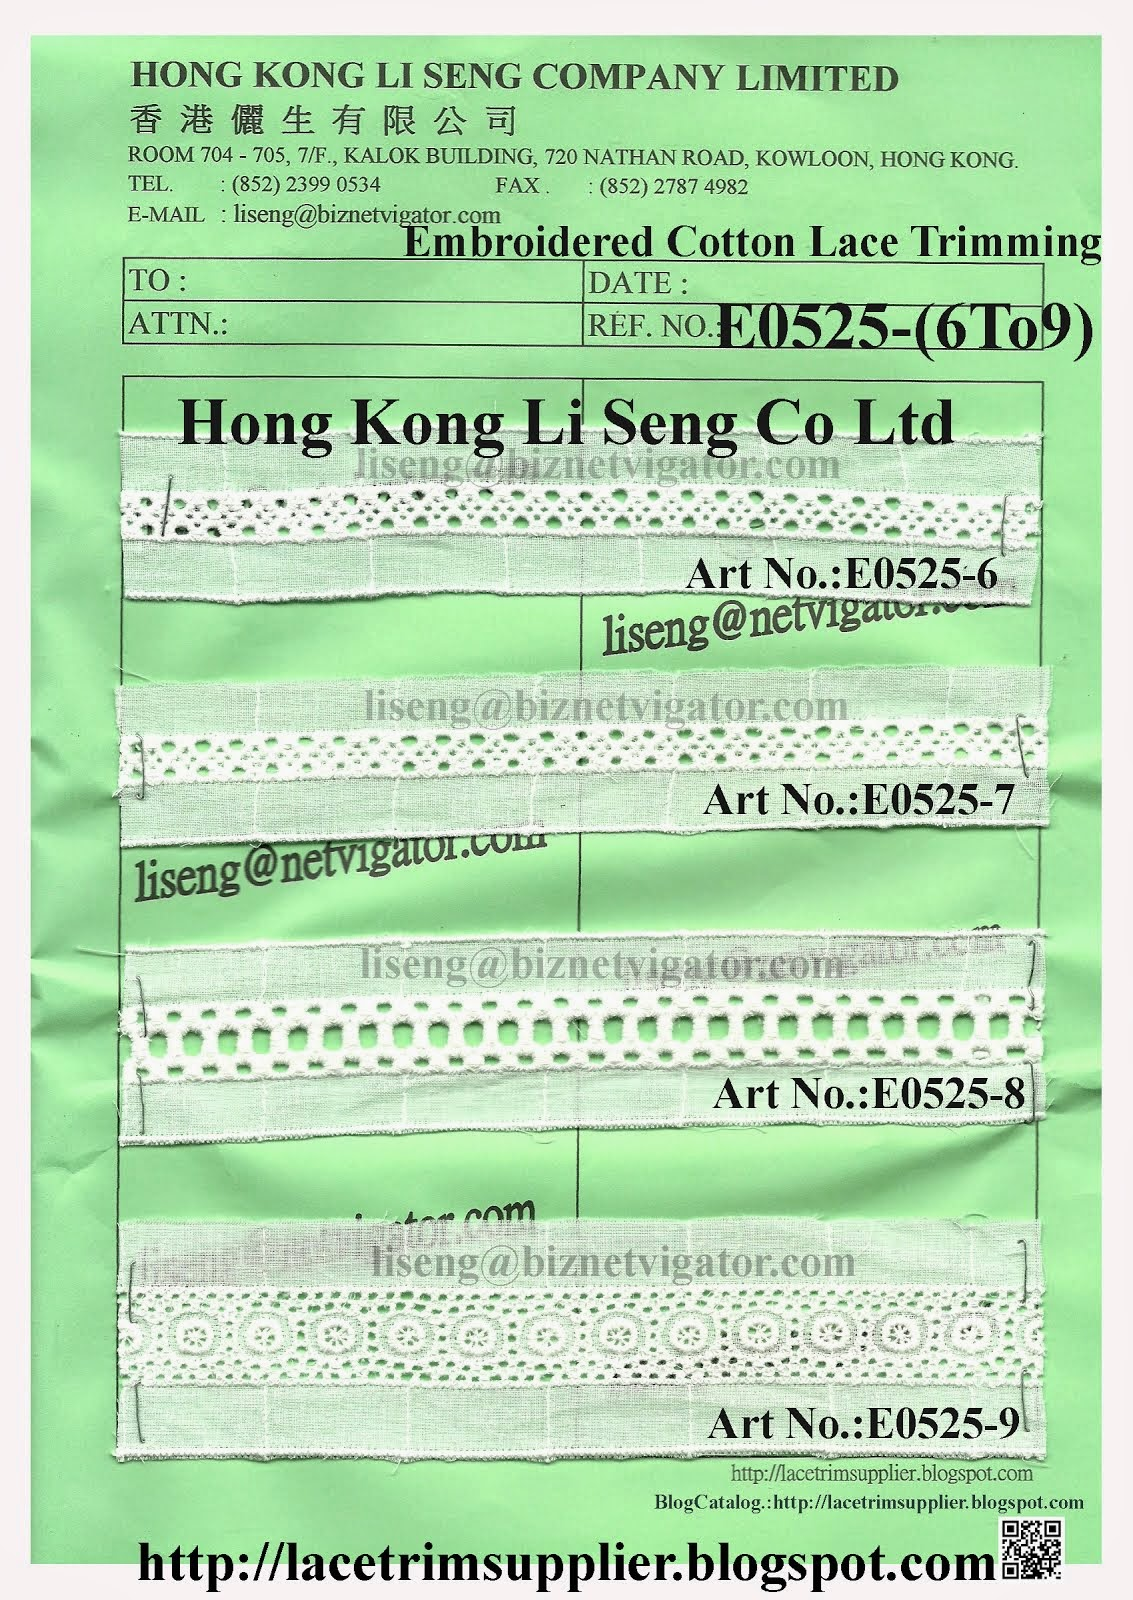 Embroidered Cotton Lace Trimming Factory - Hong Kong Li Seng Co Ltd